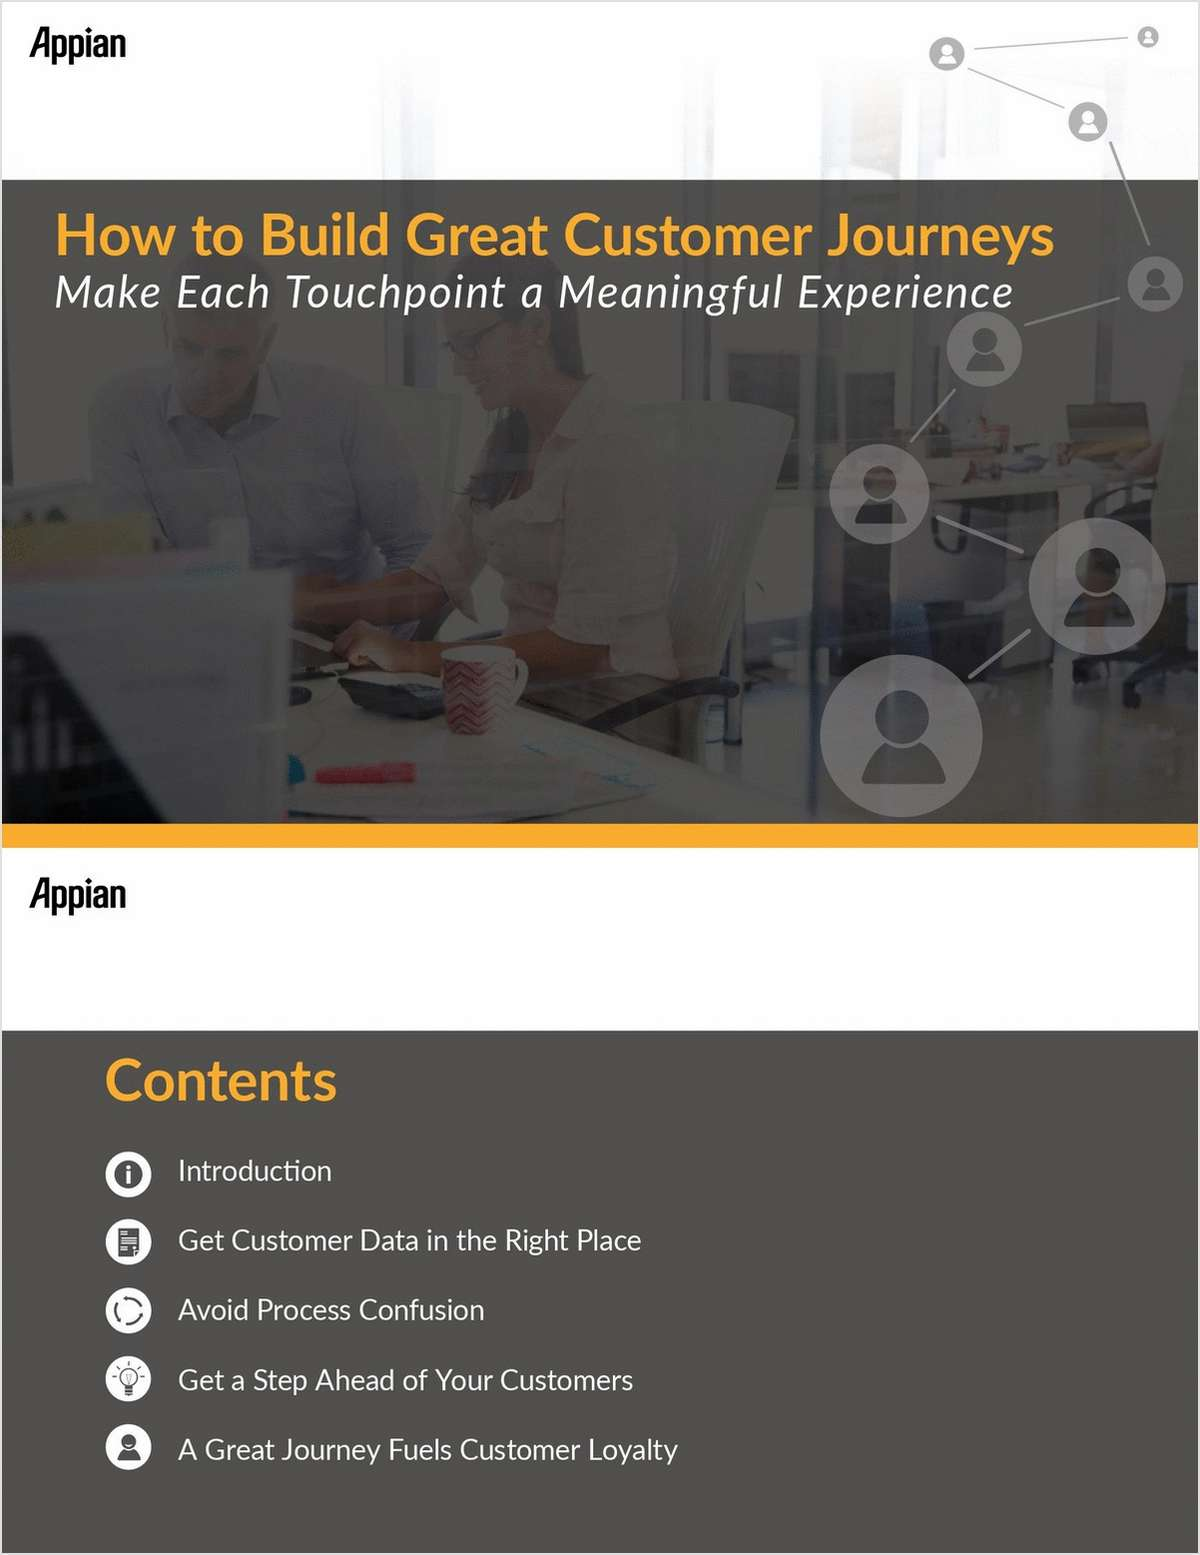 How to Build Great Customer Journeys